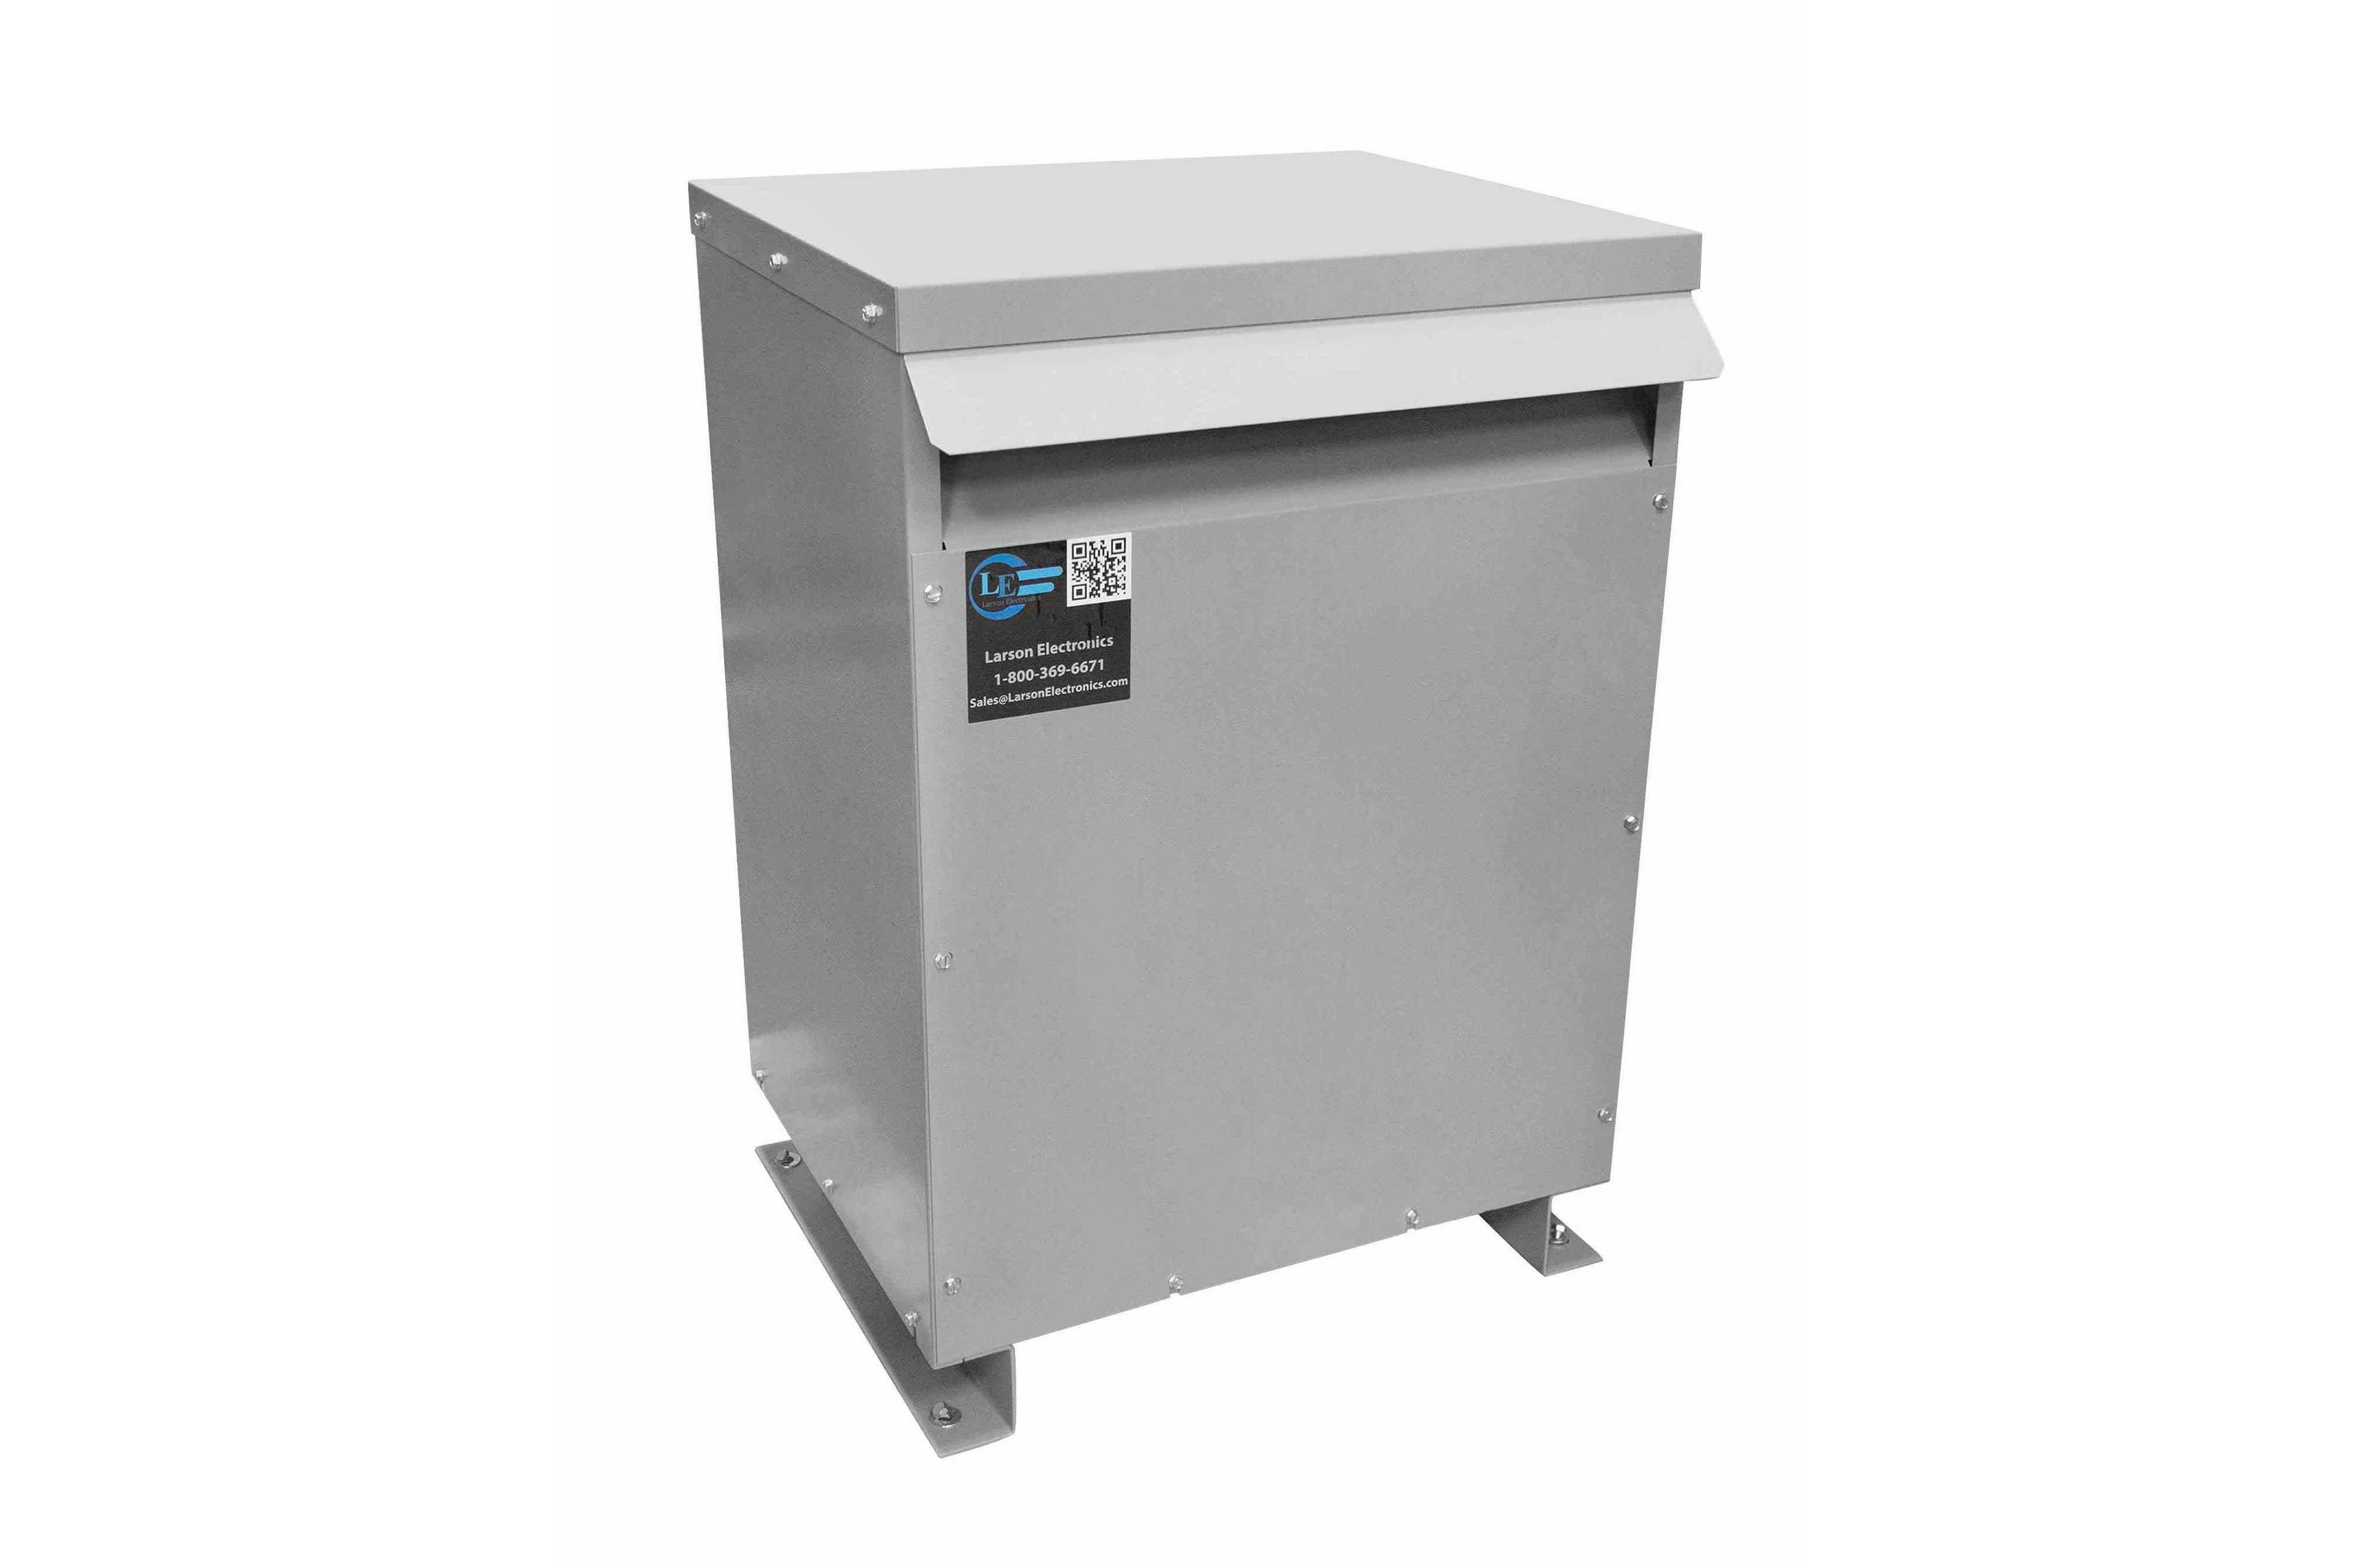 28 kVA 3PH Isolation Transformer, 480V Wye Primary, 240V/120 Delta Secondary, N3R, Ventilated, 60 Hz